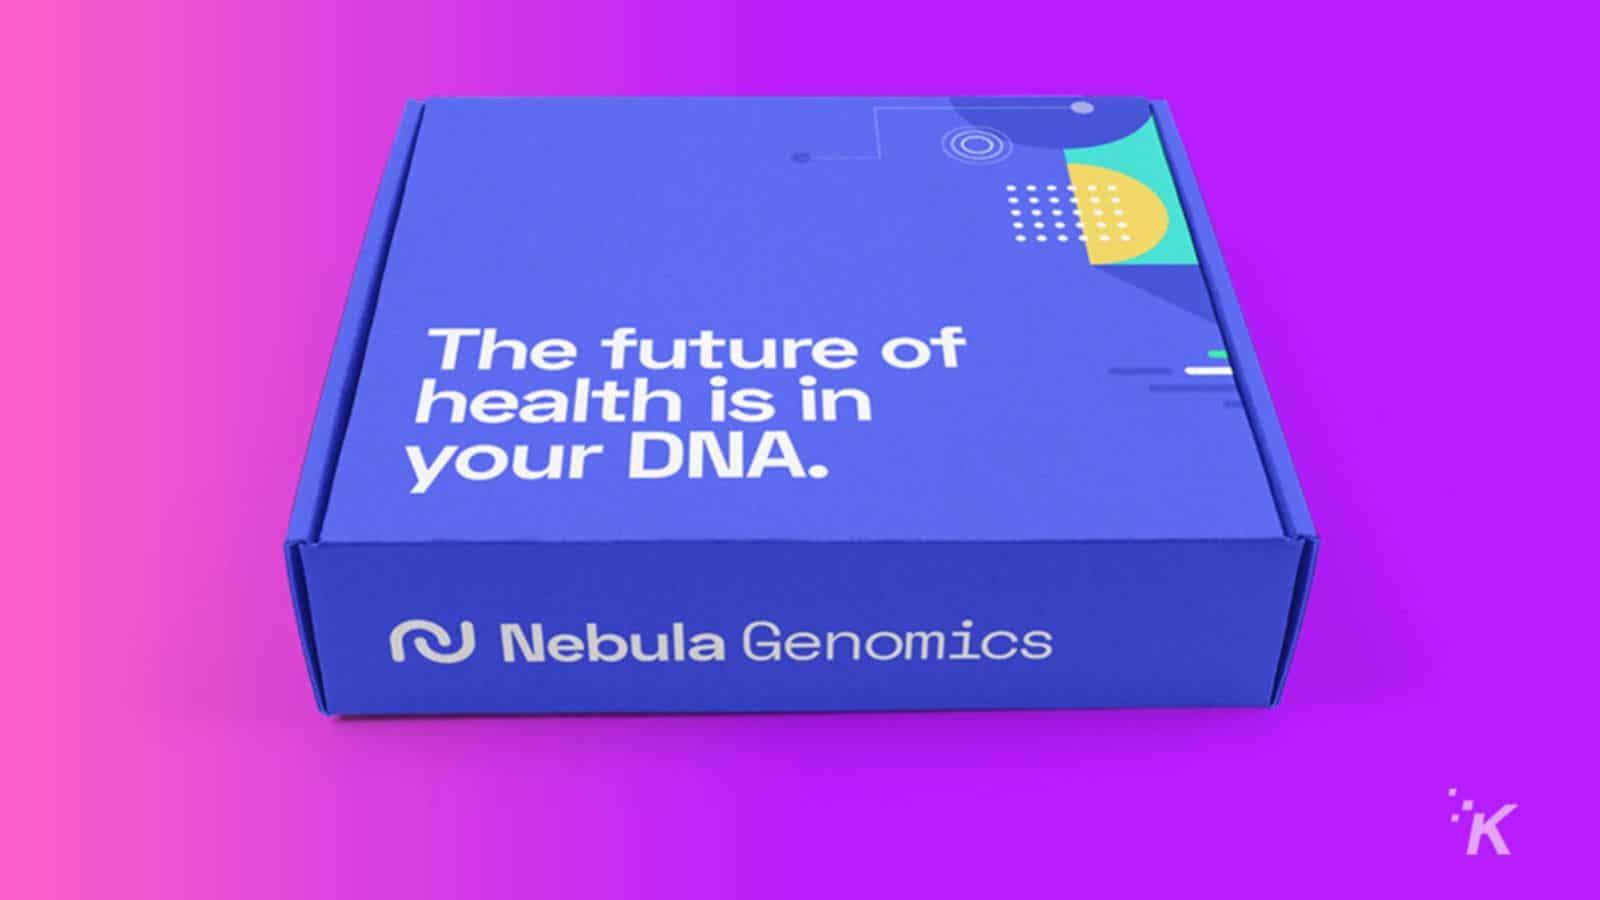 nebula genomics test kit knowtechie